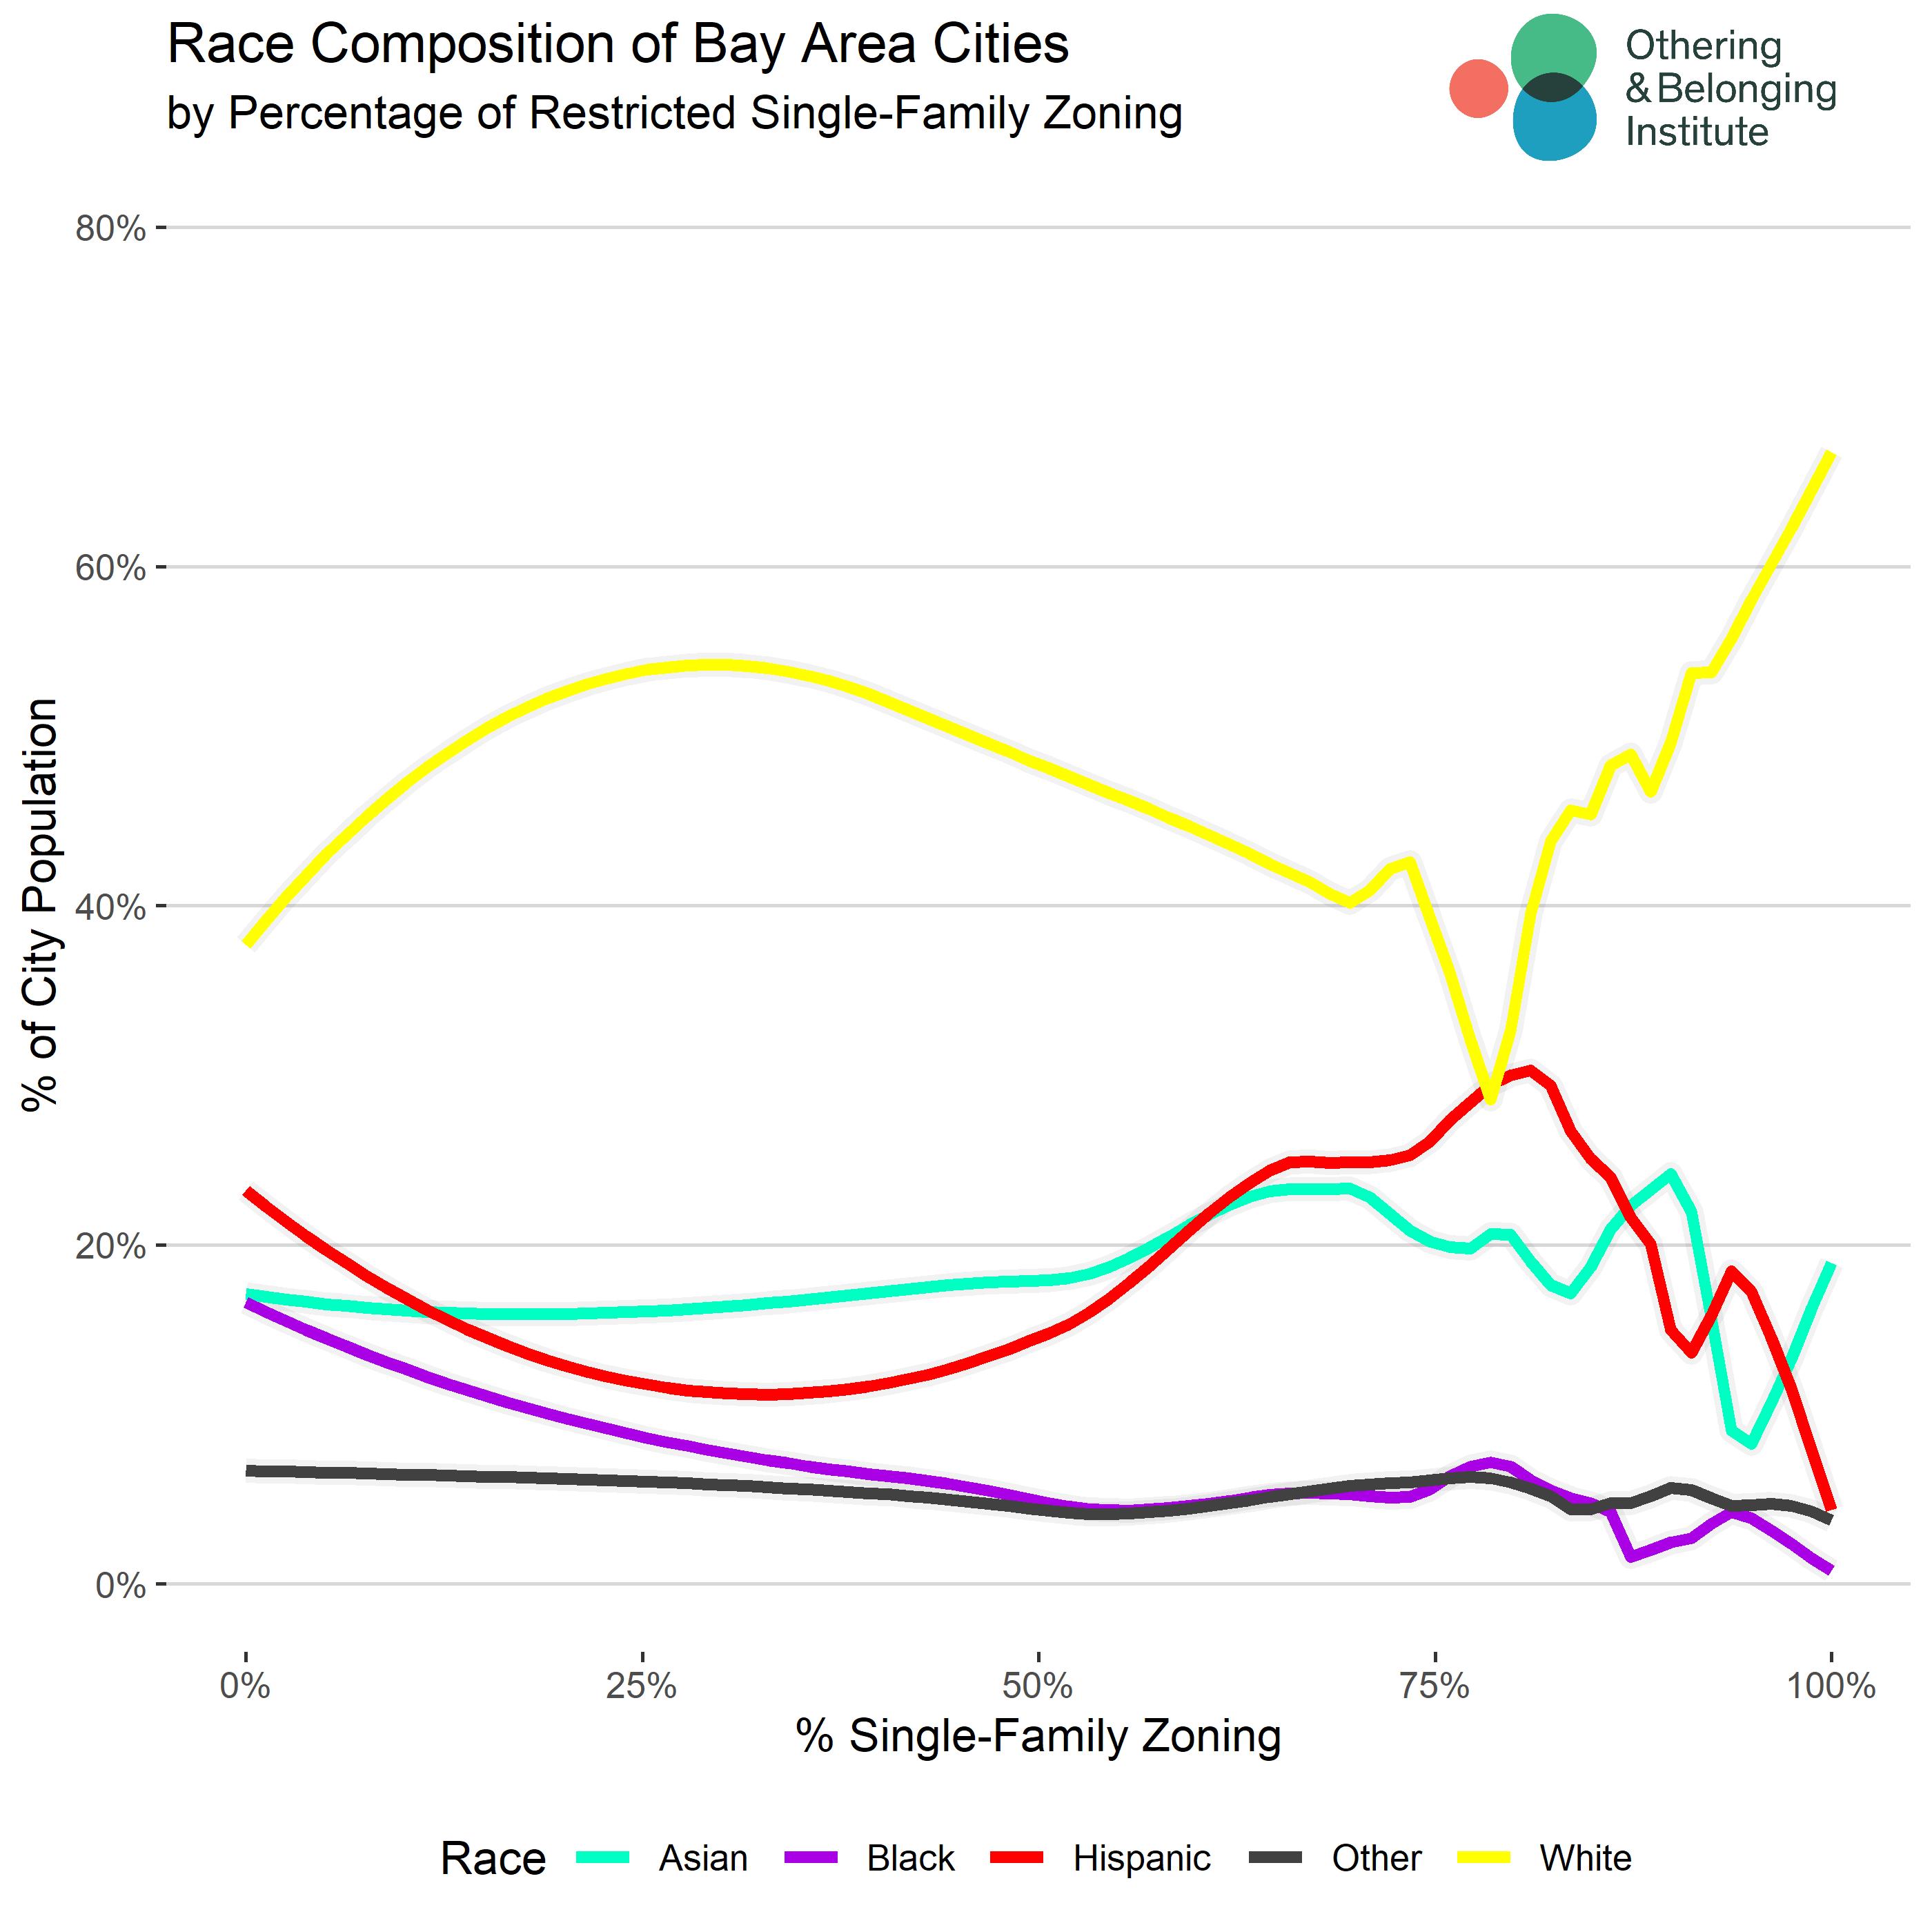 https://belonging.berkeley.edu/sites/default/files/bay_area_single_family_zoning_by_race.png